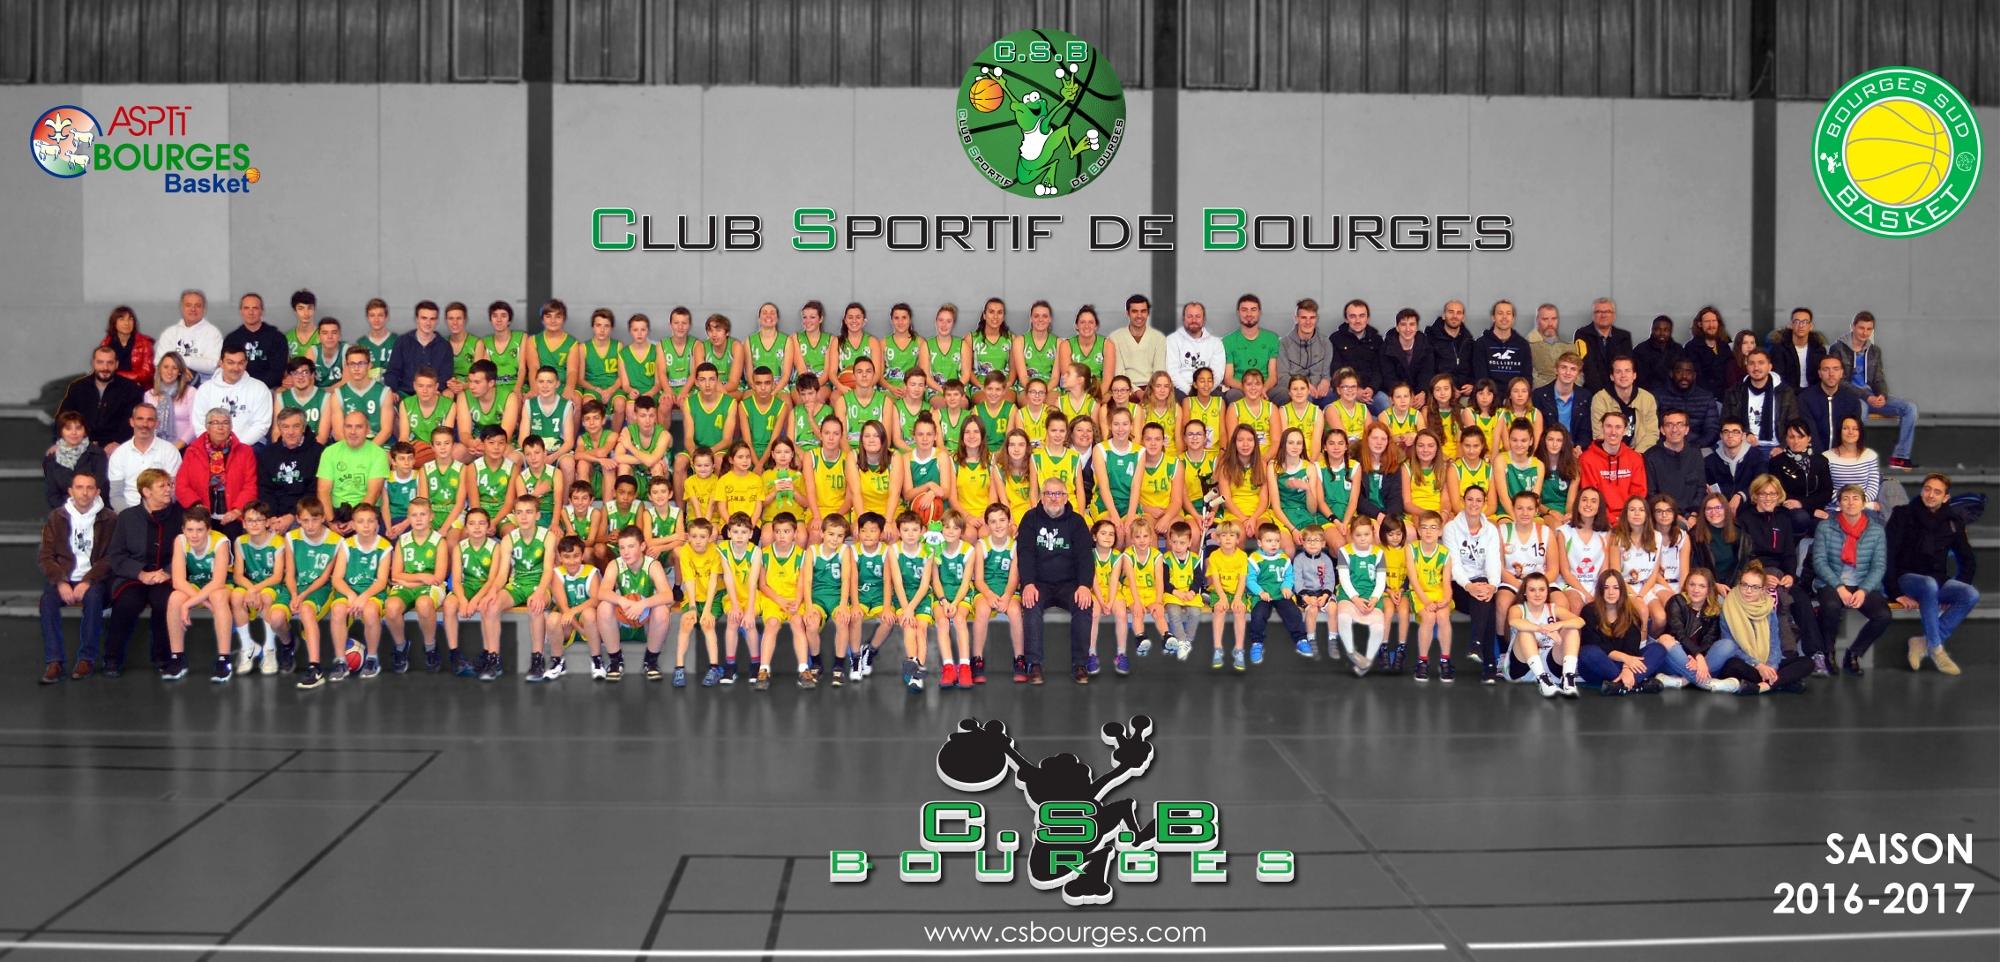 Club Sportif de Bourges